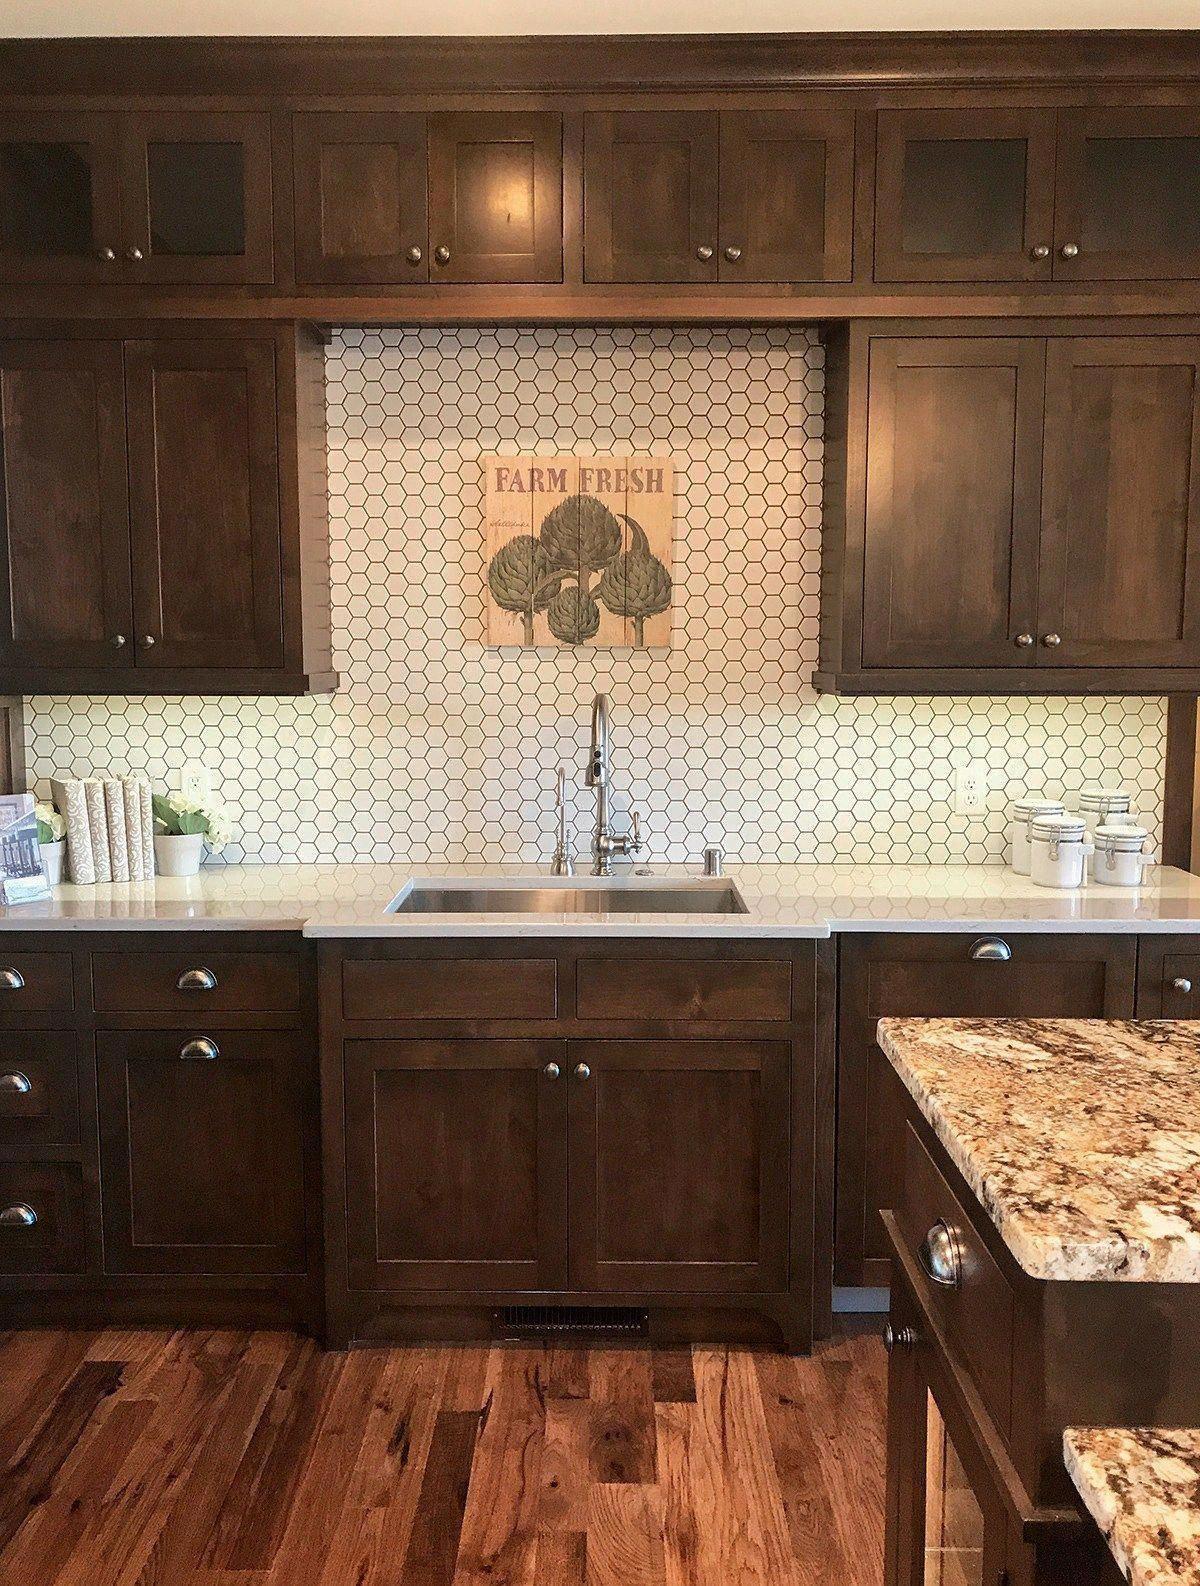 Renovate and relook kitchen shelves in 2020   Dark wood kitchen cabinets, Backsplash with dark ...